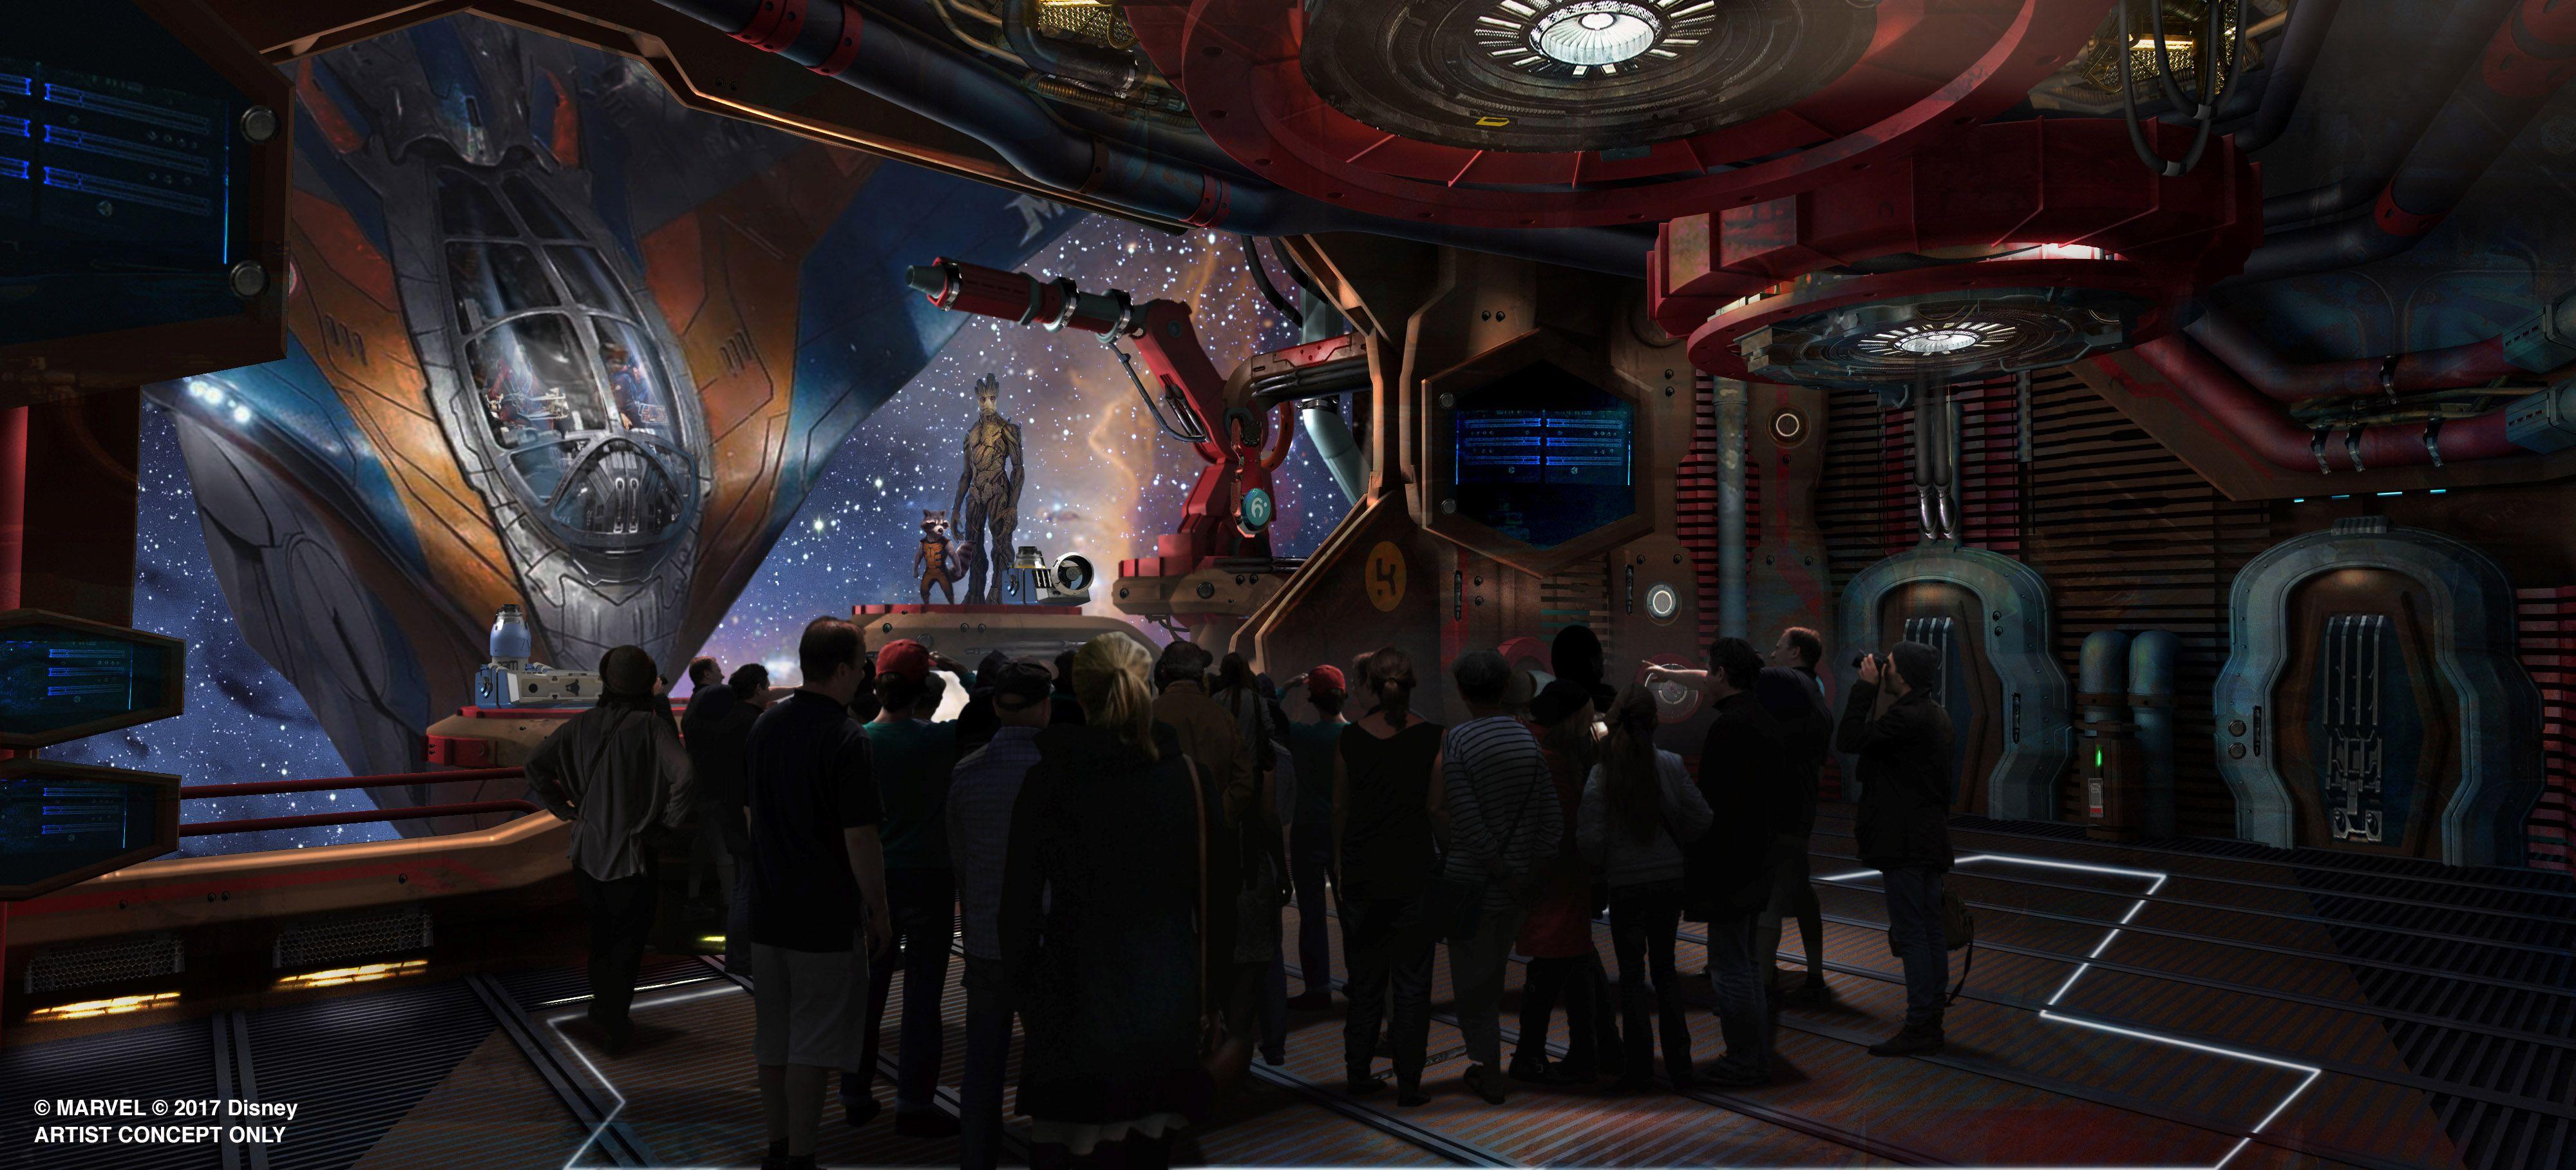 Guardians of the Galaxy Ride at Walt Disney World